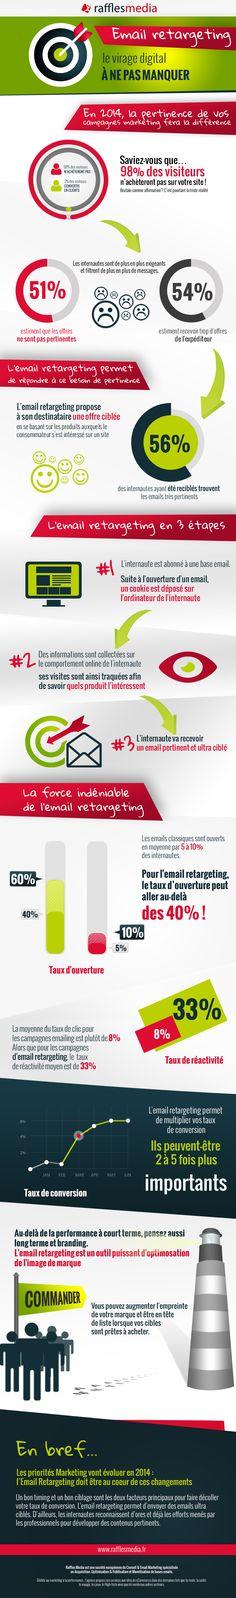 L'email retargeting: Le nouveau must du marketing digital! Inbound Marketing, Email Marketing, Content Marketing, Social Media Marketing, Digital Marketing, Marketing Strategies, Visualisation, Data Visualization, Opt In